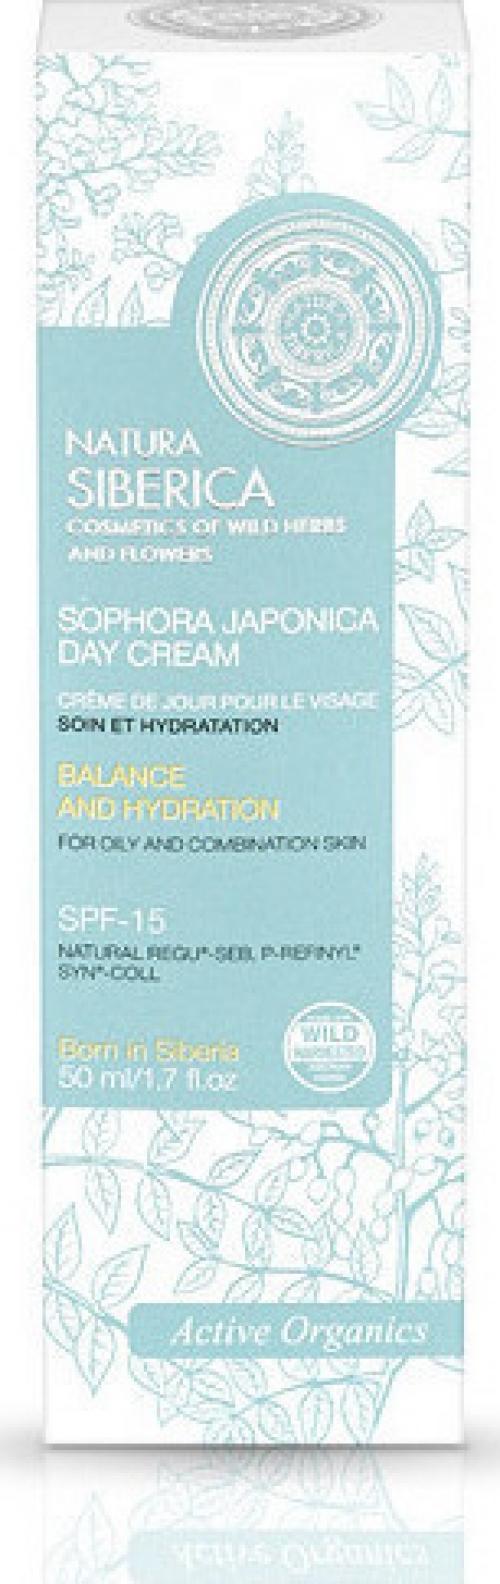 Sophora Japonica Day Cream, Εξισορρόπηση και Ενυδάτωση, για λιπαρά και μικτά δέρματα, με αντιηλιακή προστασία SPF-15, 50 ml (Κατάλληλο για ηλικίες 22+)